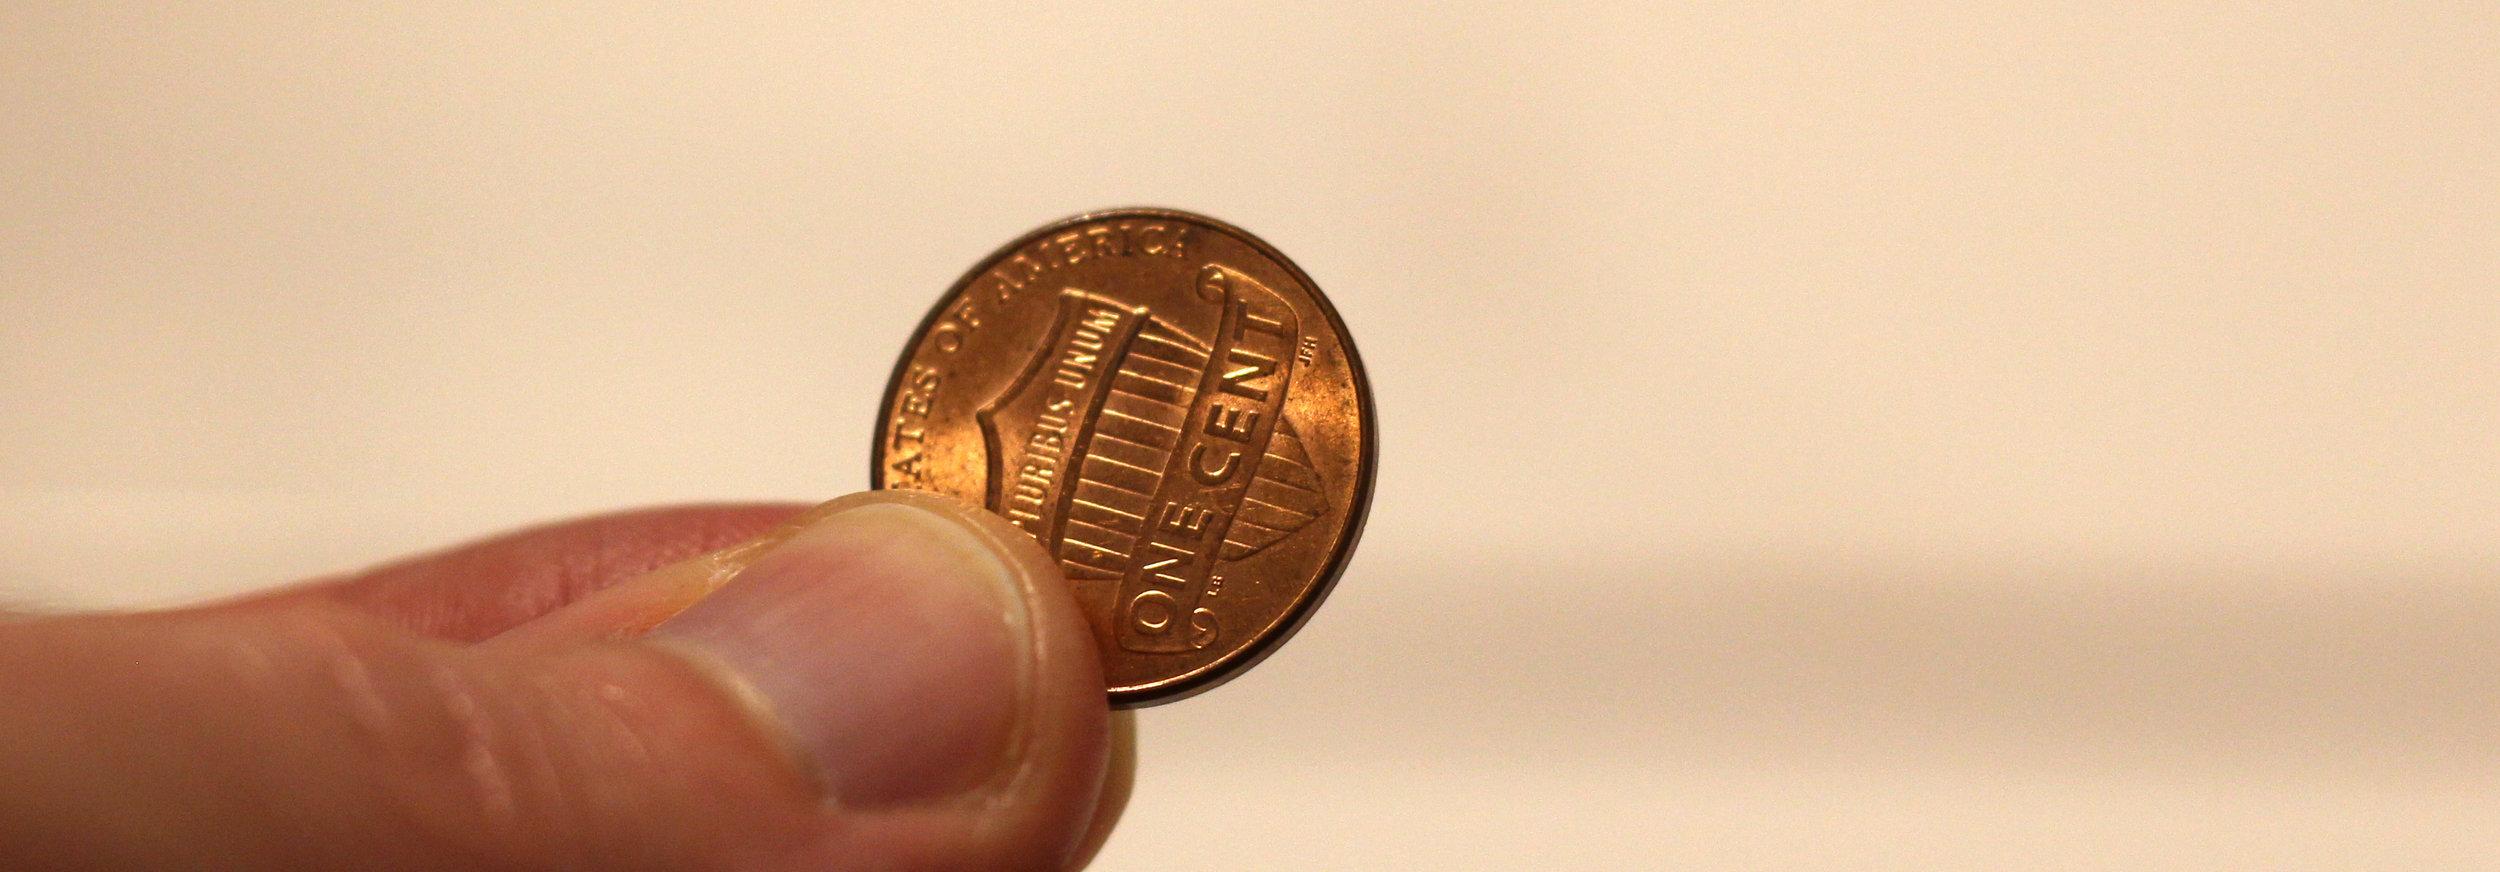 penny crop.jpg